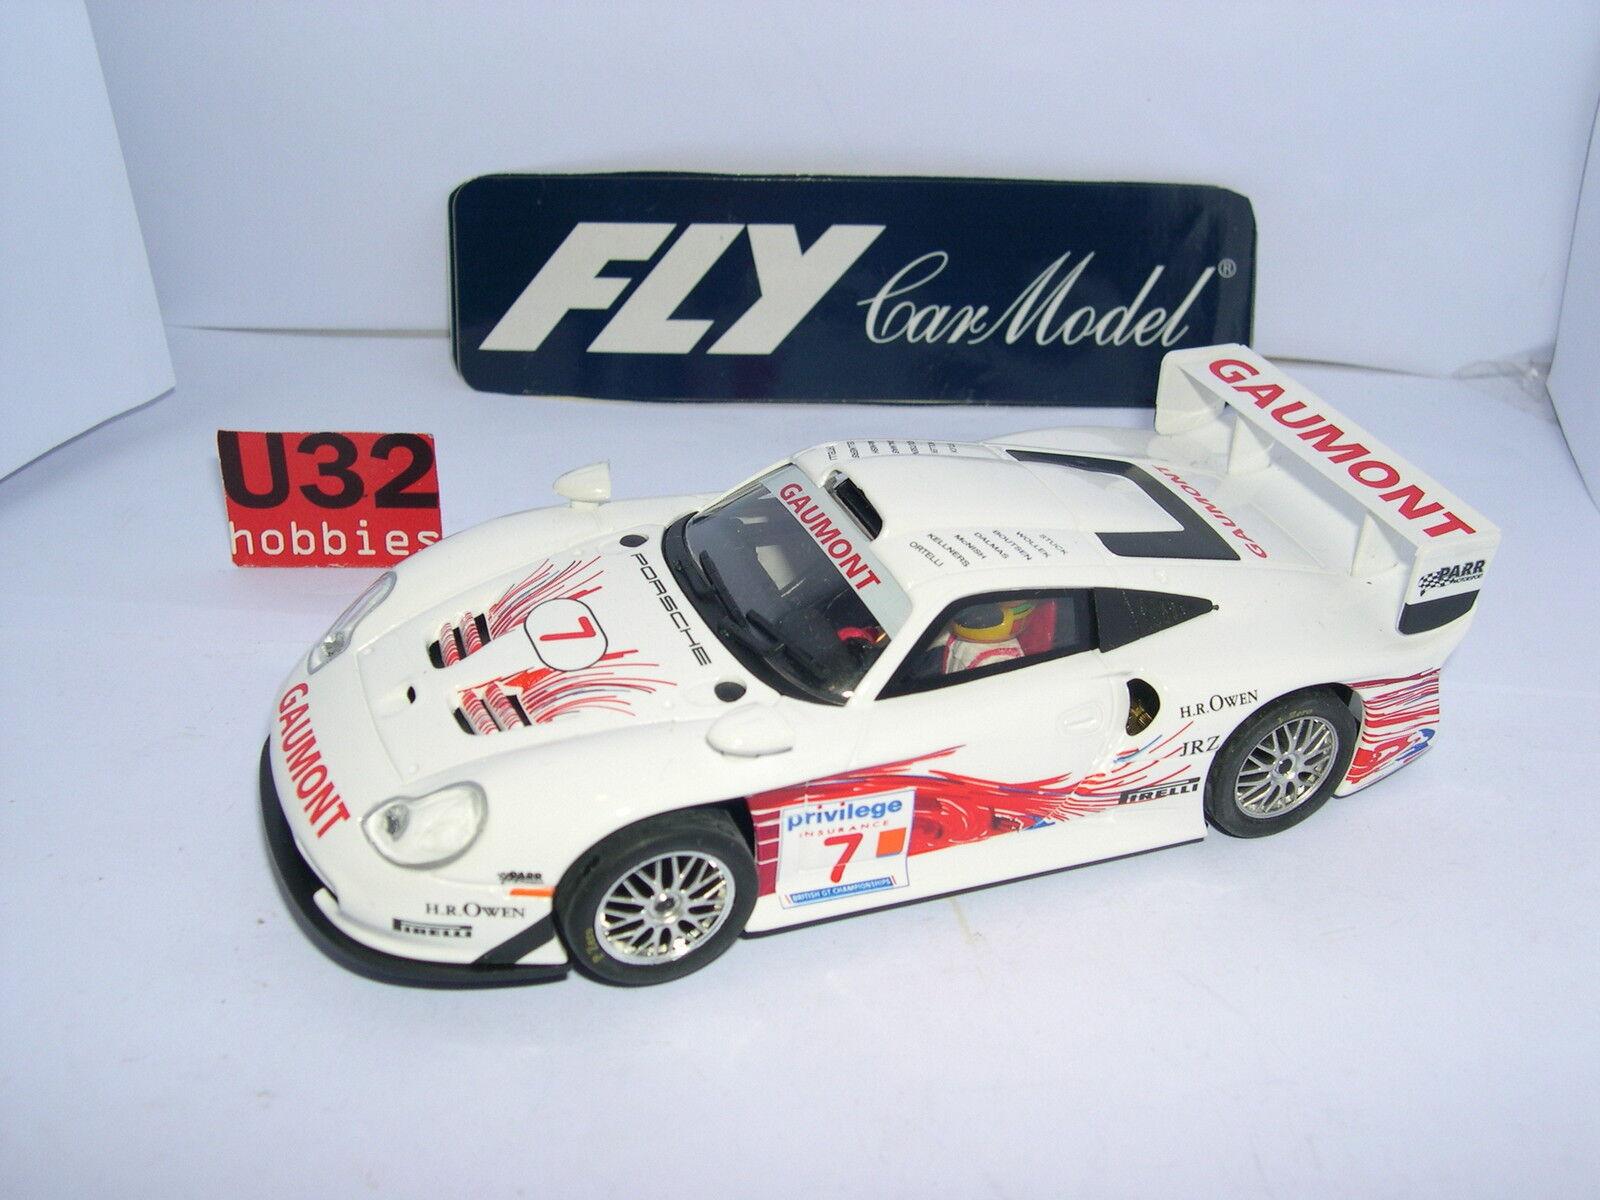 FLY FLY FLY COLLECTION CRIN PORSCHE 911 GT1 EVO #7 BGTC 1969 COMME NEUF BOITE OUVERTE 0c6dc1